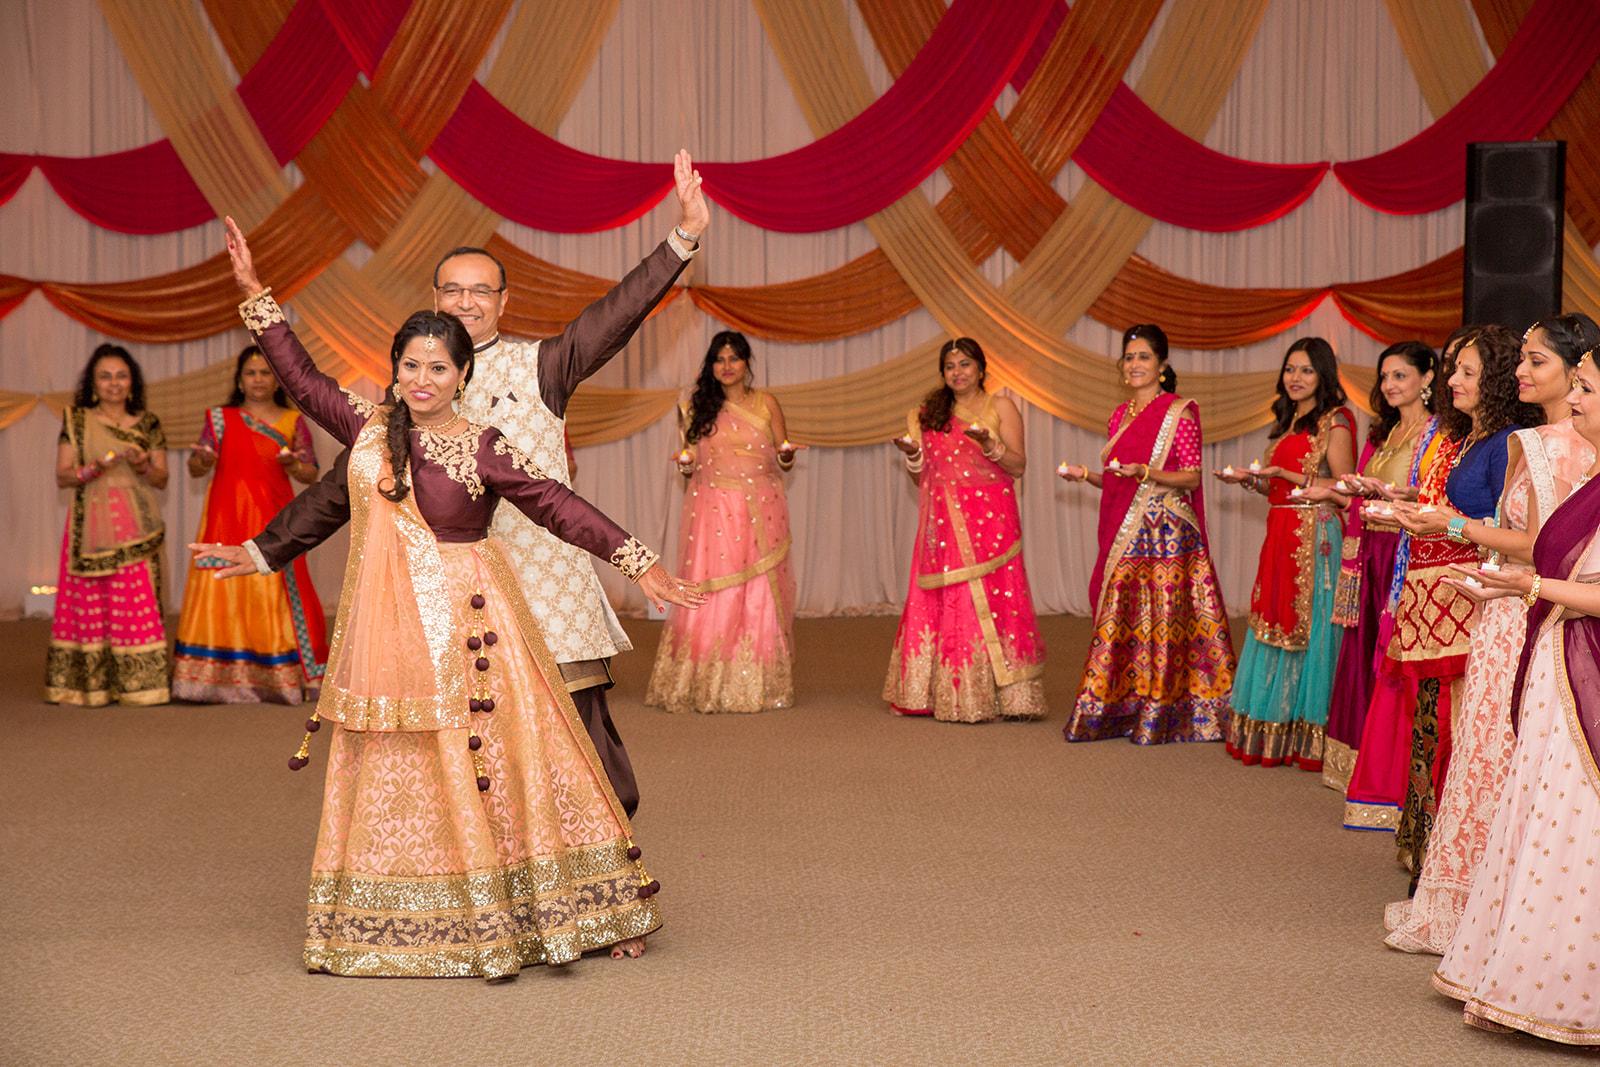 Le Cape Weddings - Puja and Kheelan - Garba A   -253.jpg